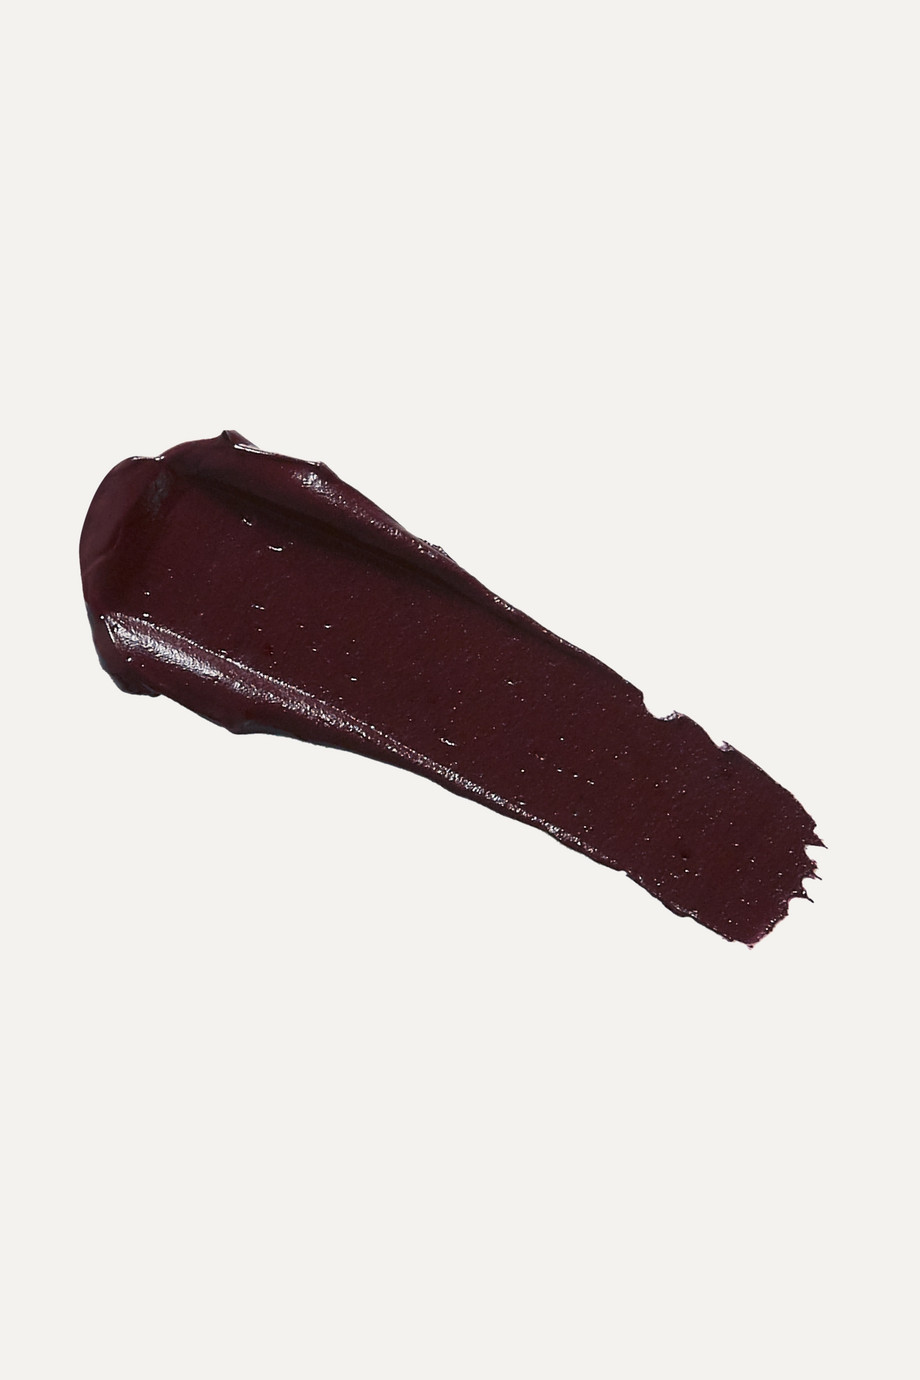 Burberry Beauty Liquid Lip Velvet - Black Cherry No.57